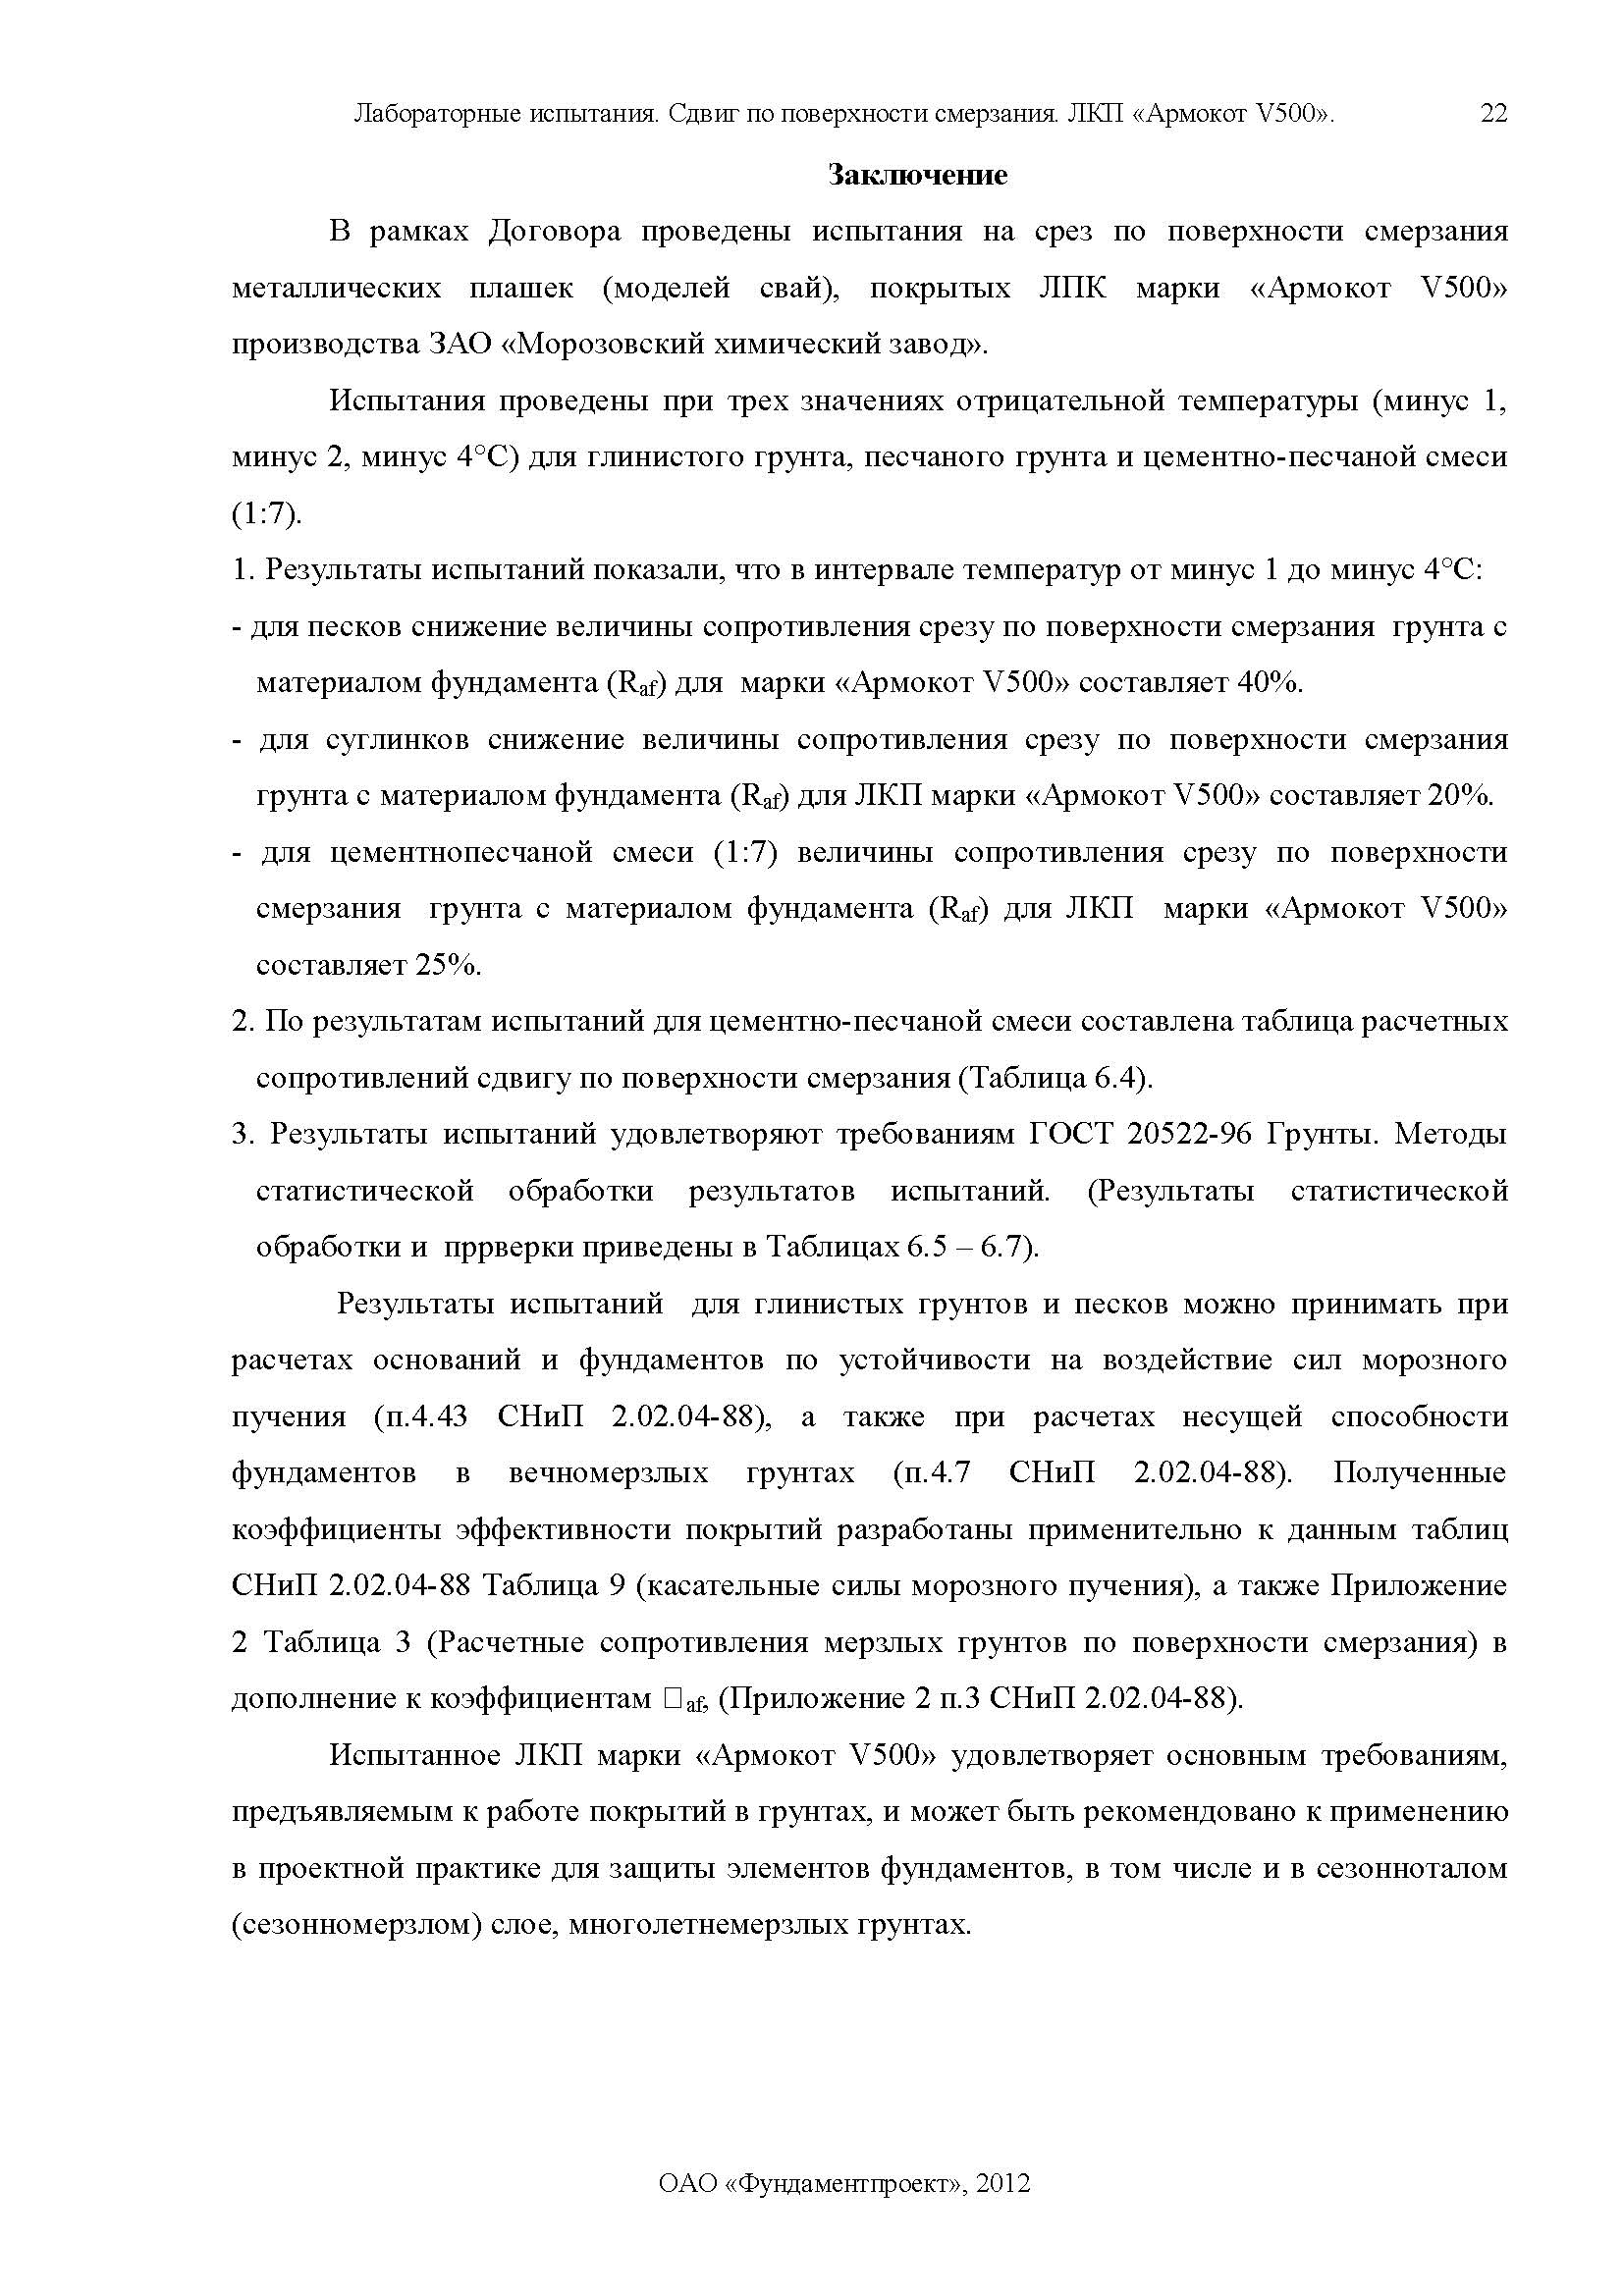 Отчет по сваям Армокот V500 Фундаментпроект_Страница_22